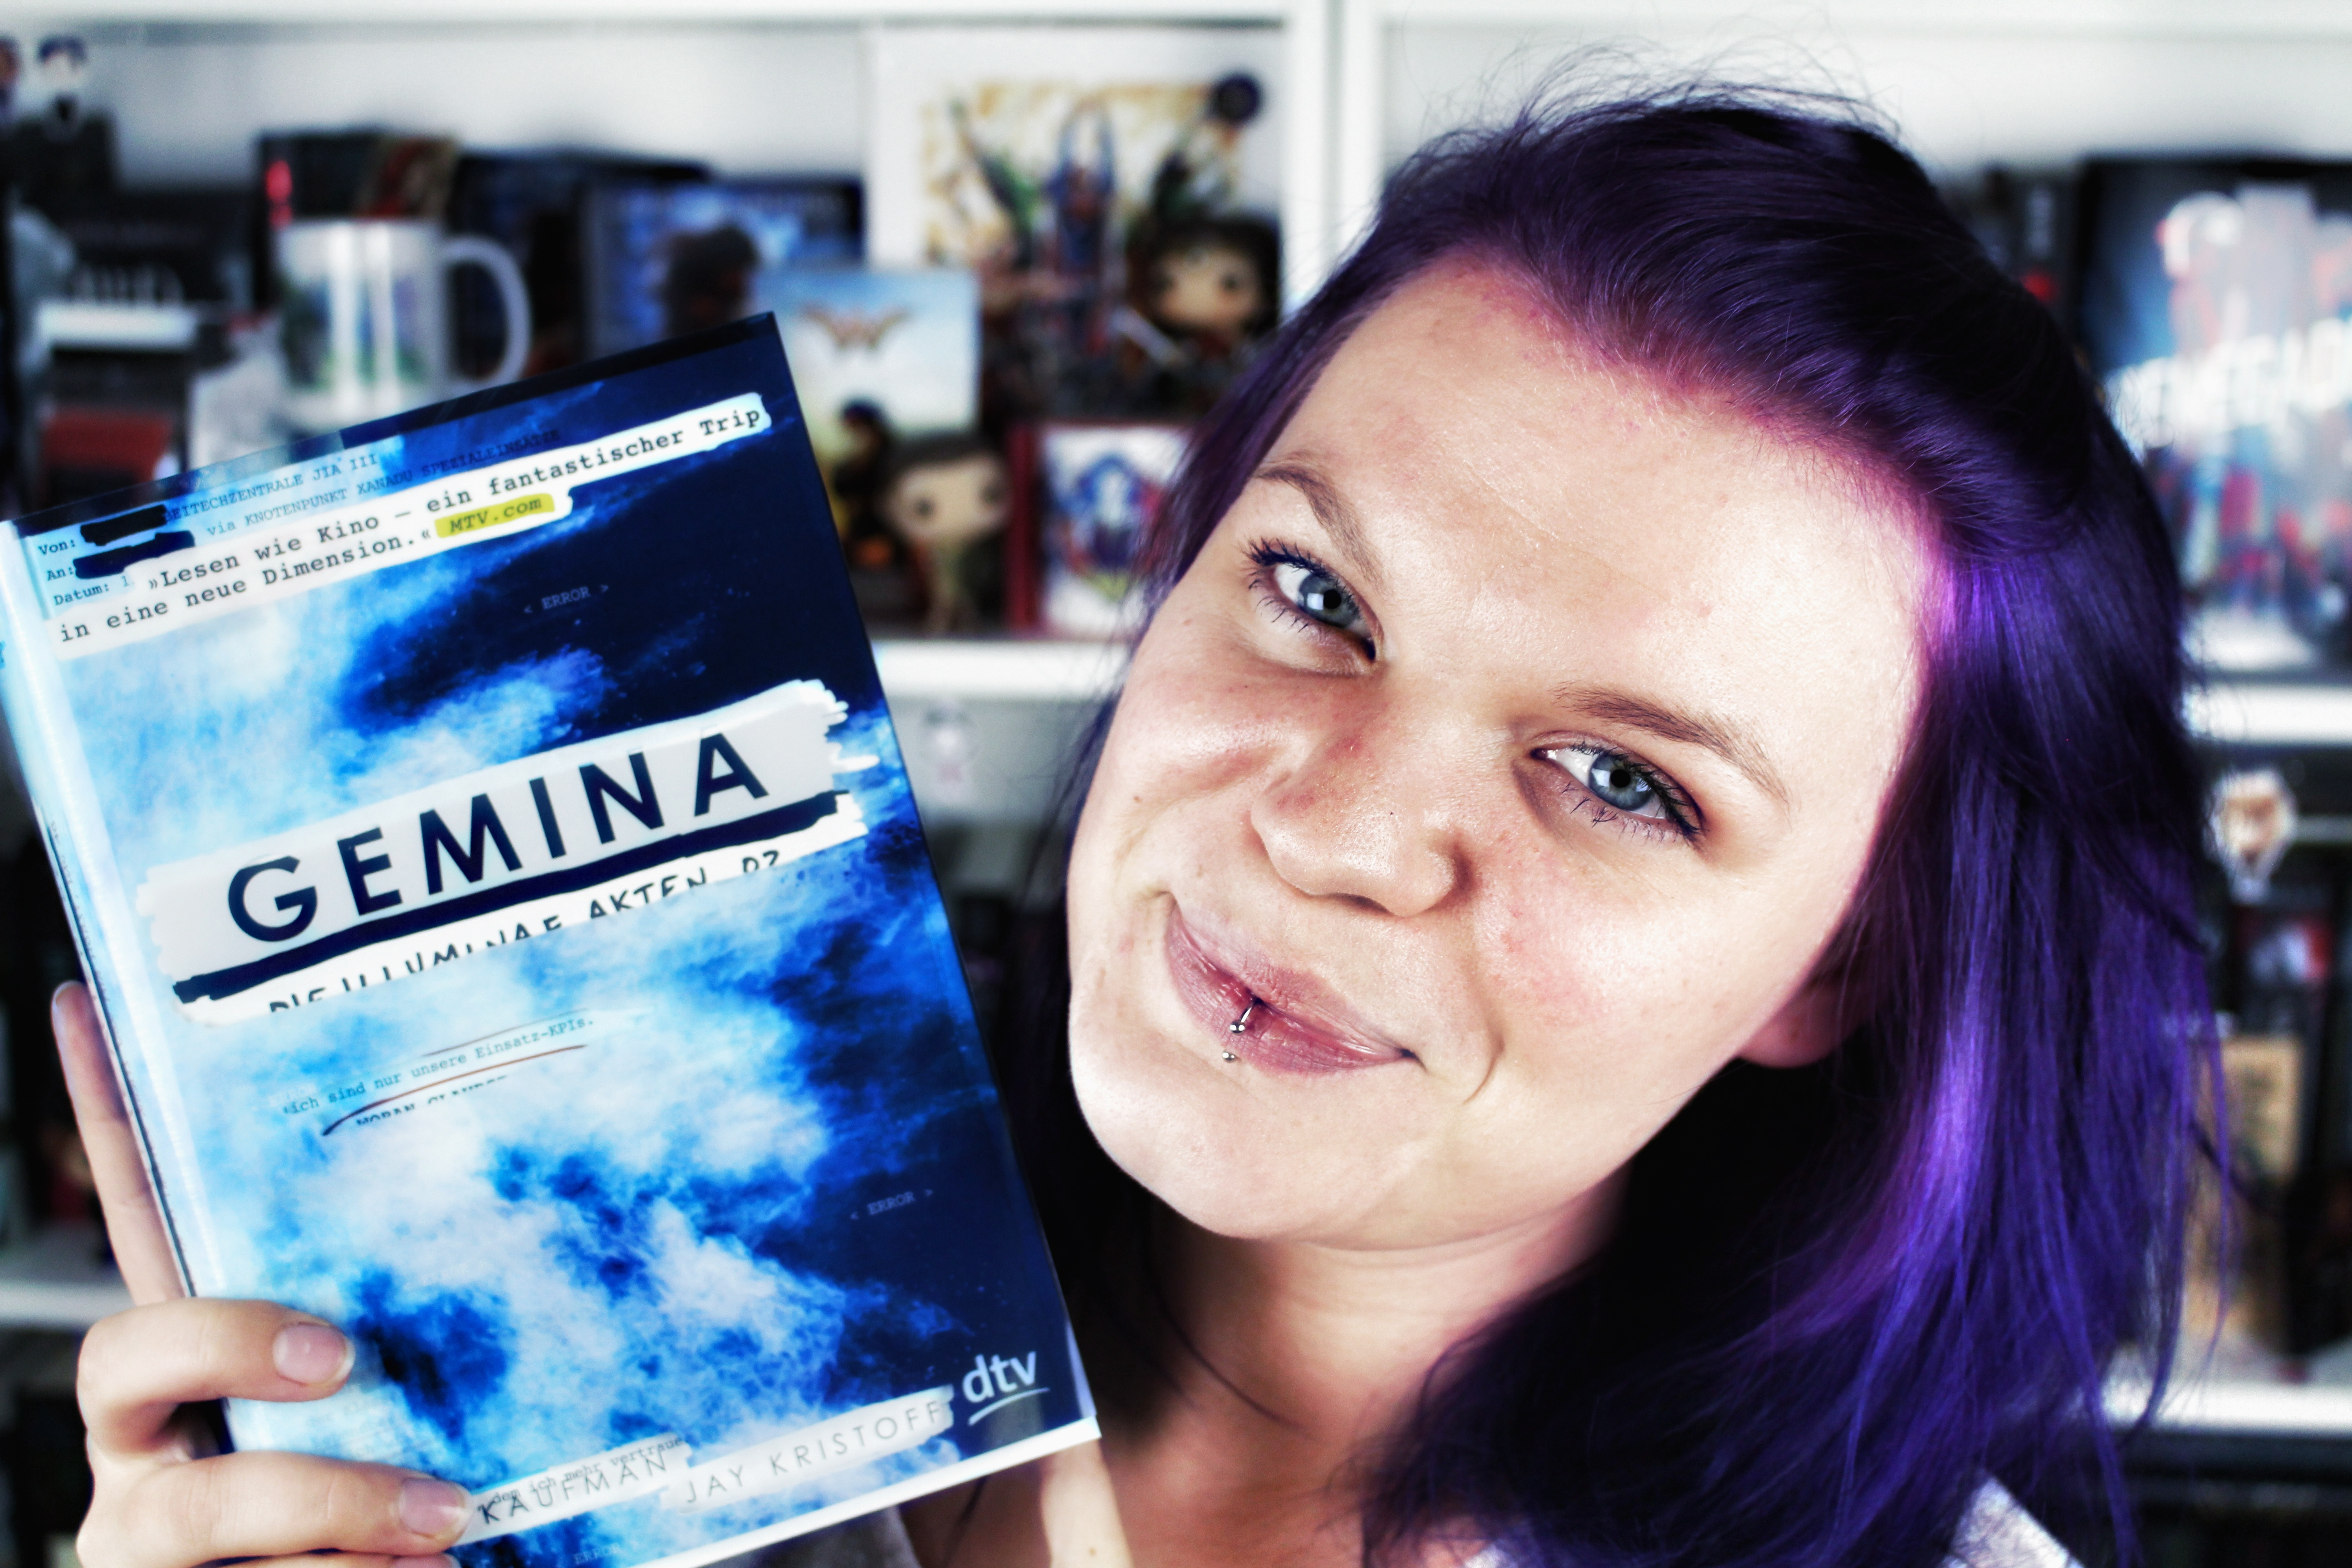 Rezension: Gemina. Die Illuminae Akten 02 / Amy Kaufman & Jay Kristoff